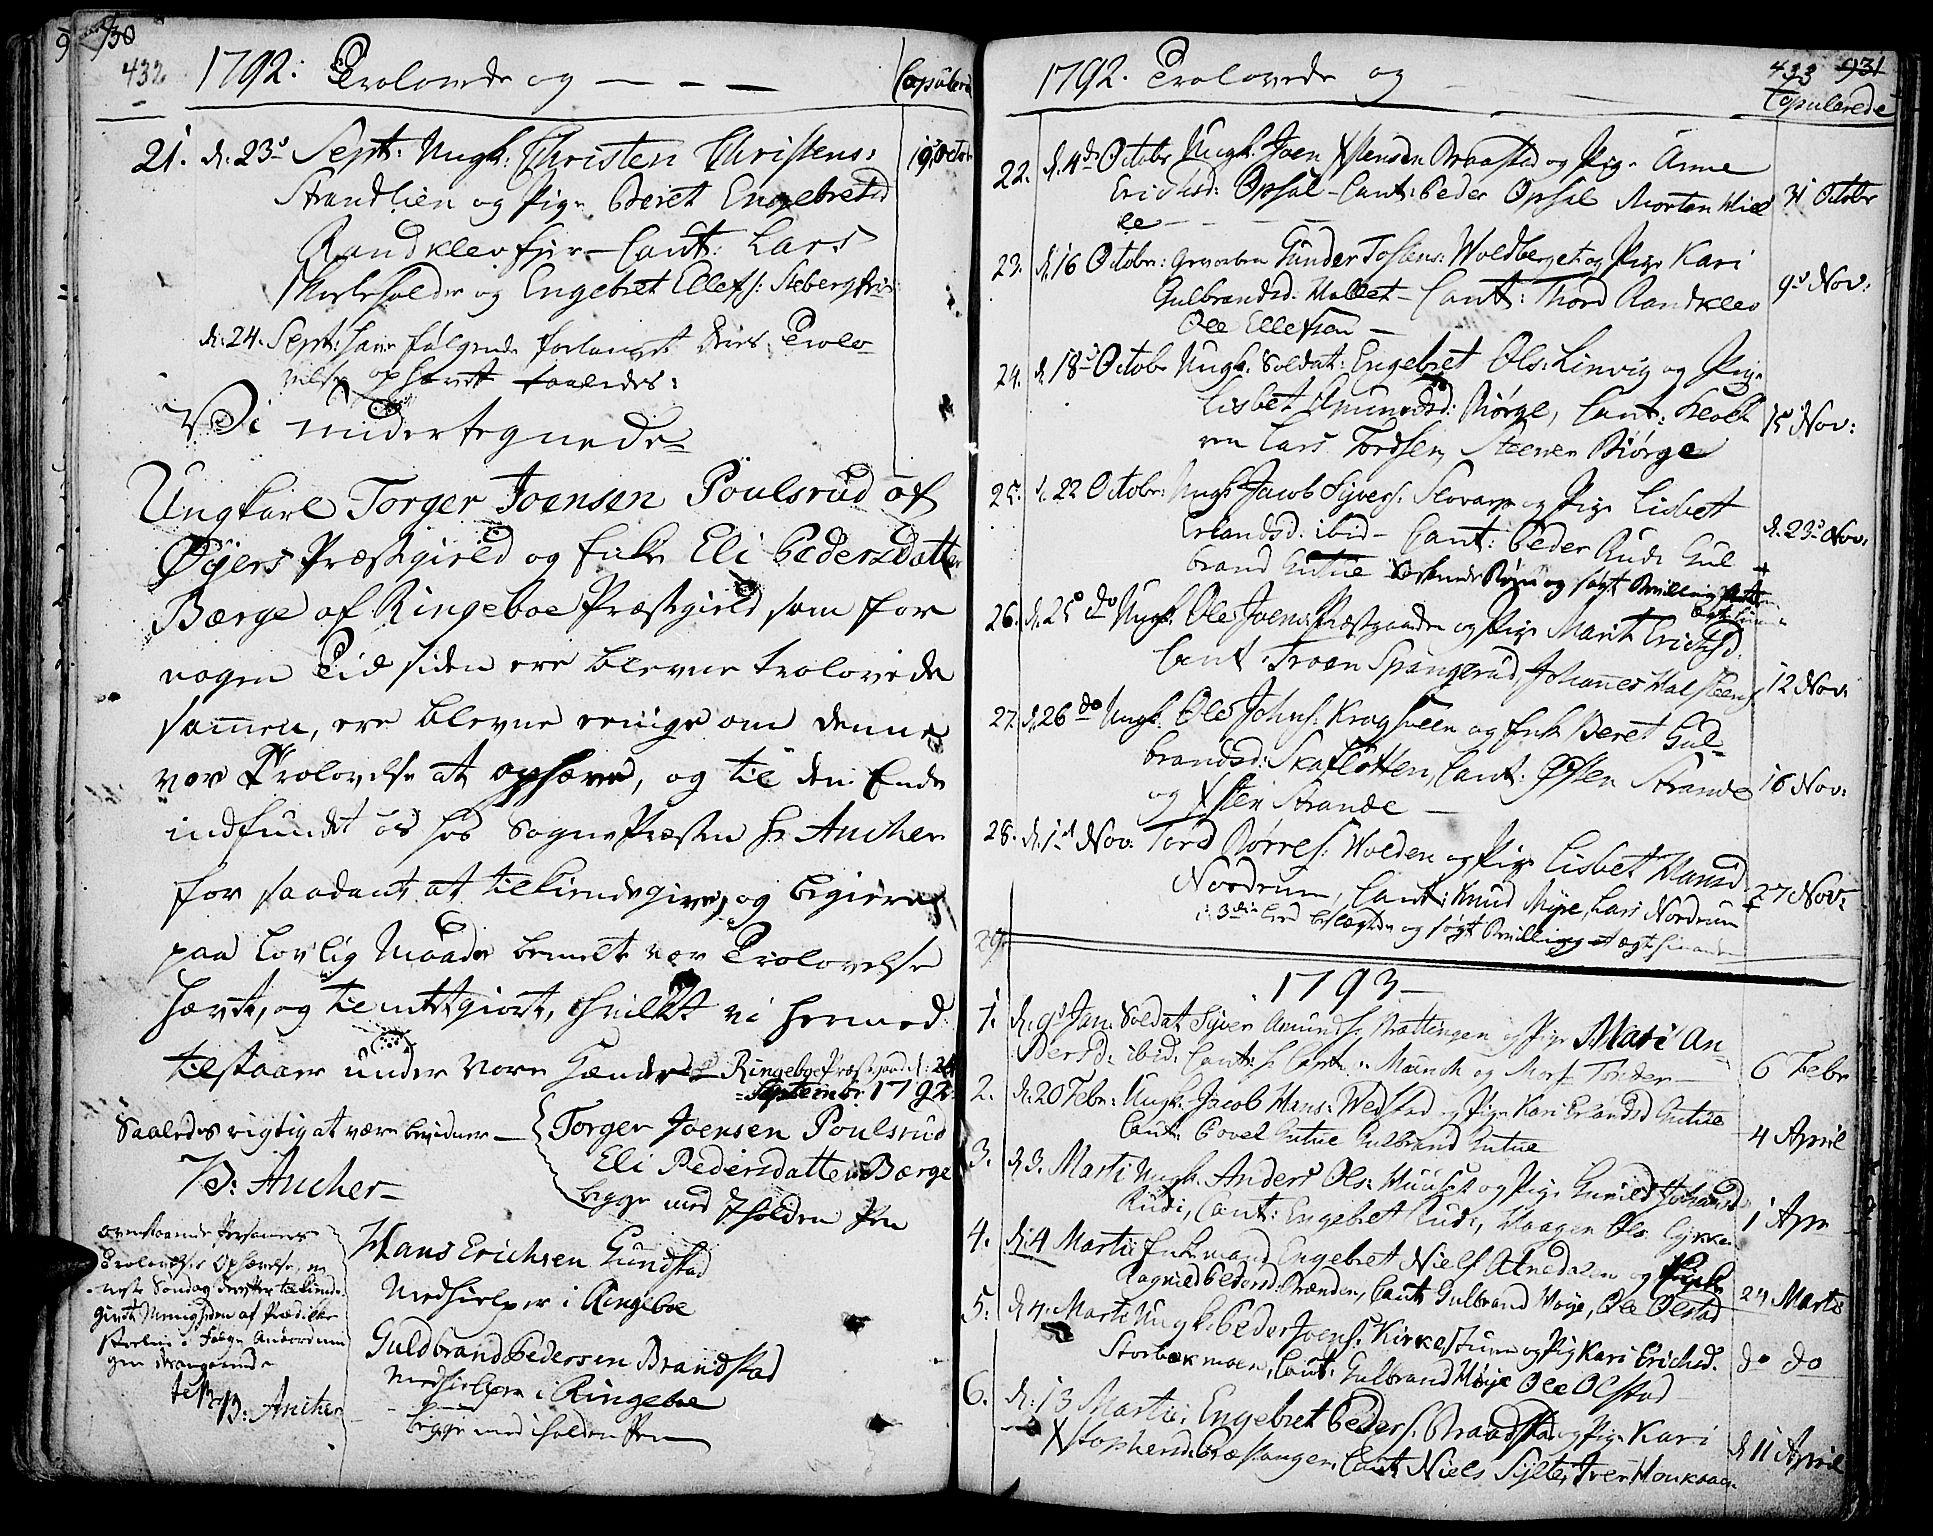 SAH, Ringebu prestekontor, Ministerialbok nr. 3, 1781-1820, s. 432-433